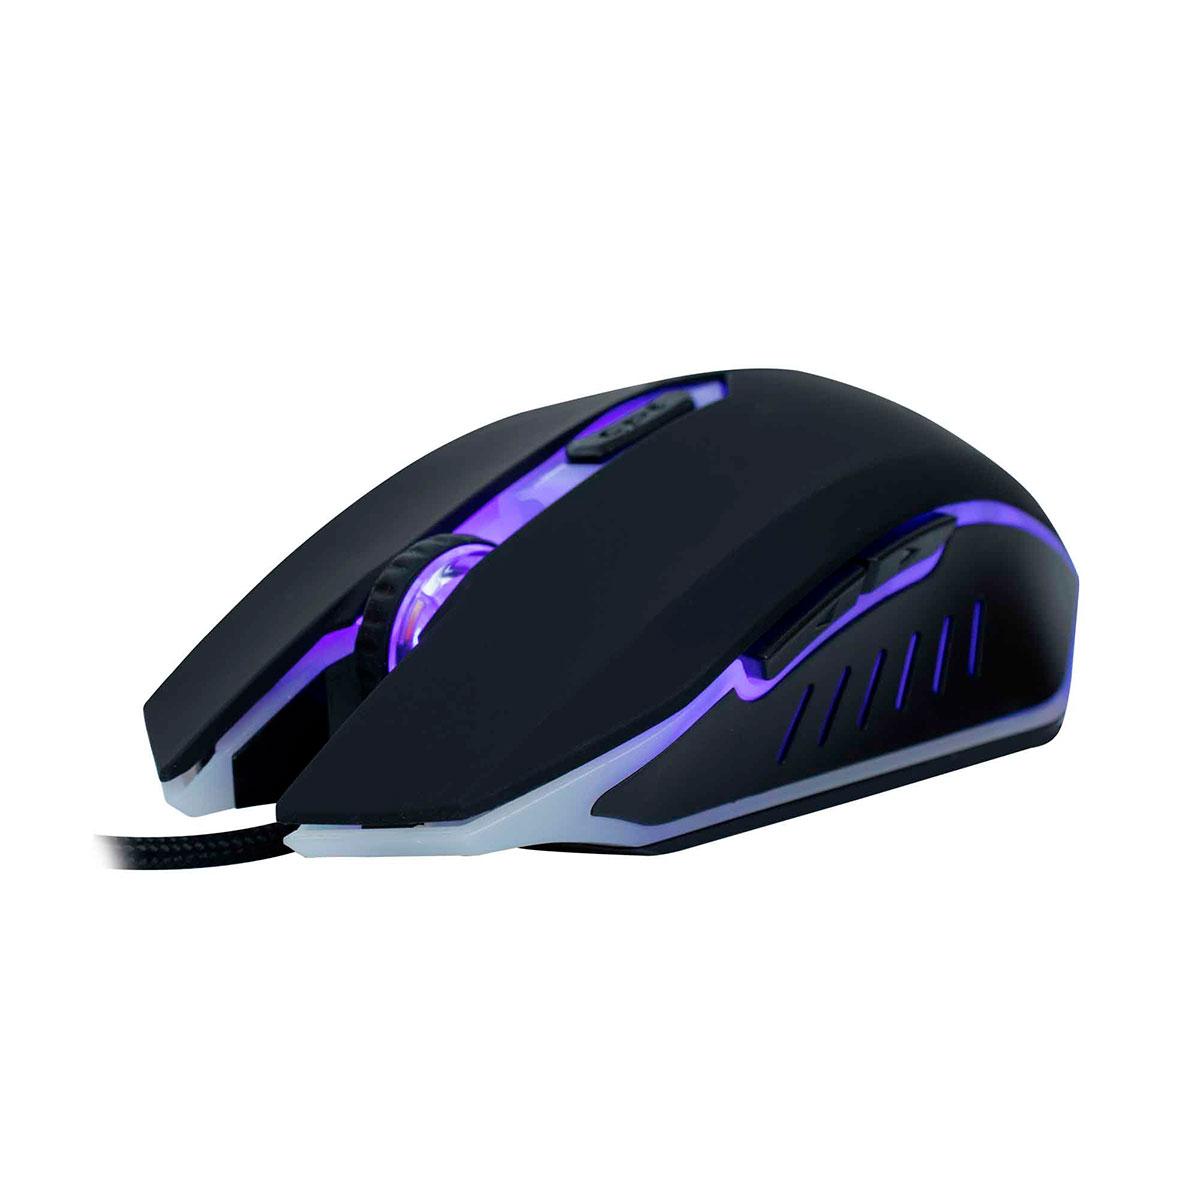 Mouse Gamer OEX Action Reloaded MS300, 3200DPI, 6 Botões, Luz de LED 7 Cores, USB